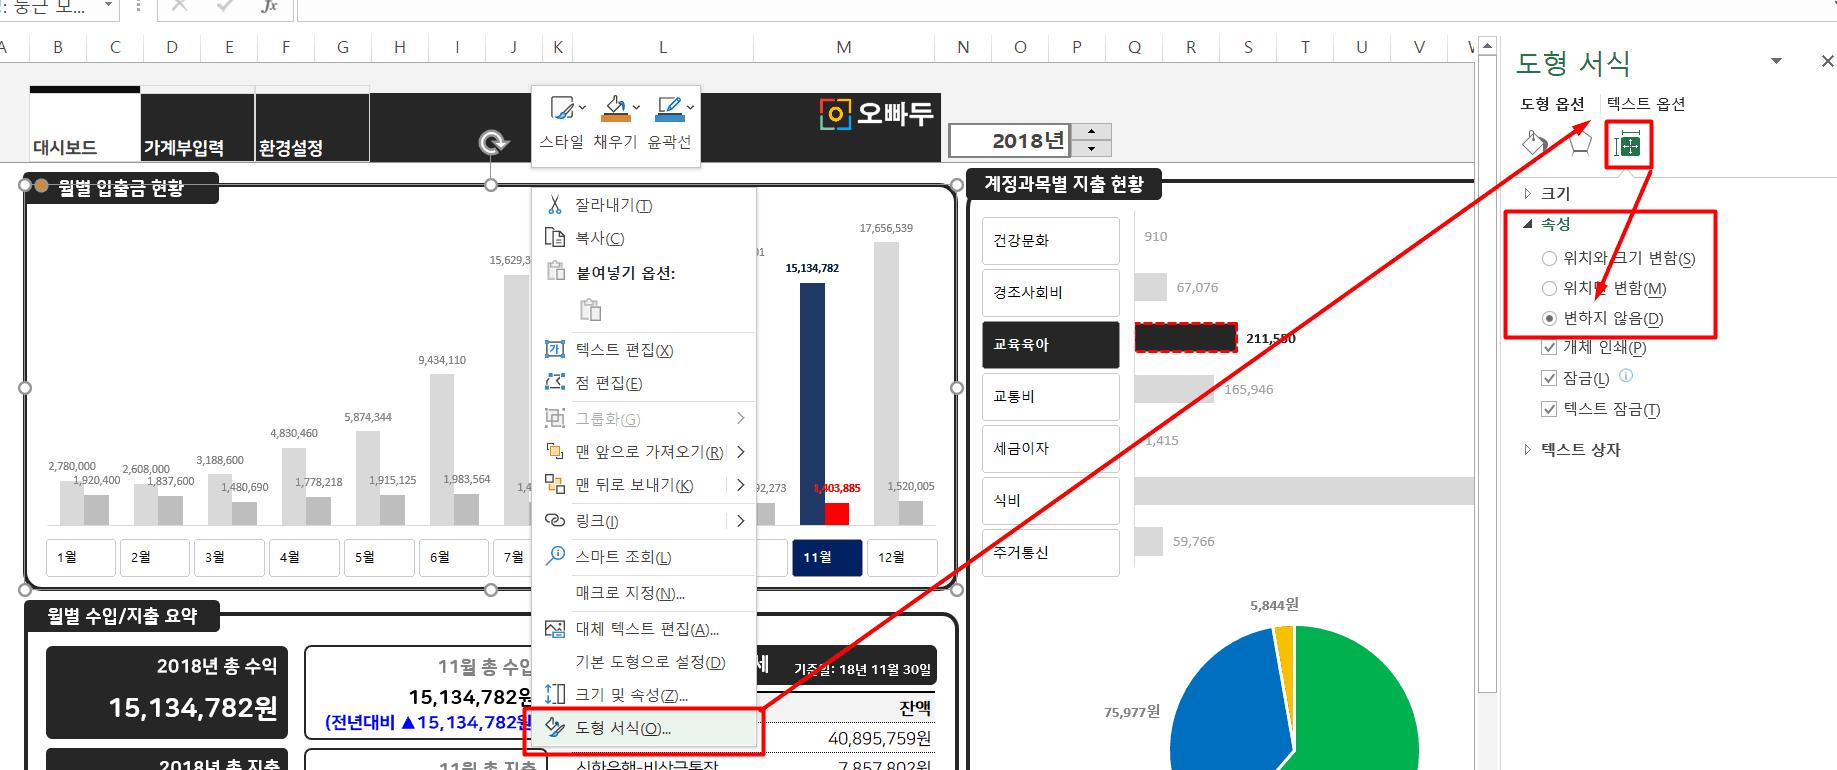 1f. 엑셀 도형 위치 크기 변하지 않음